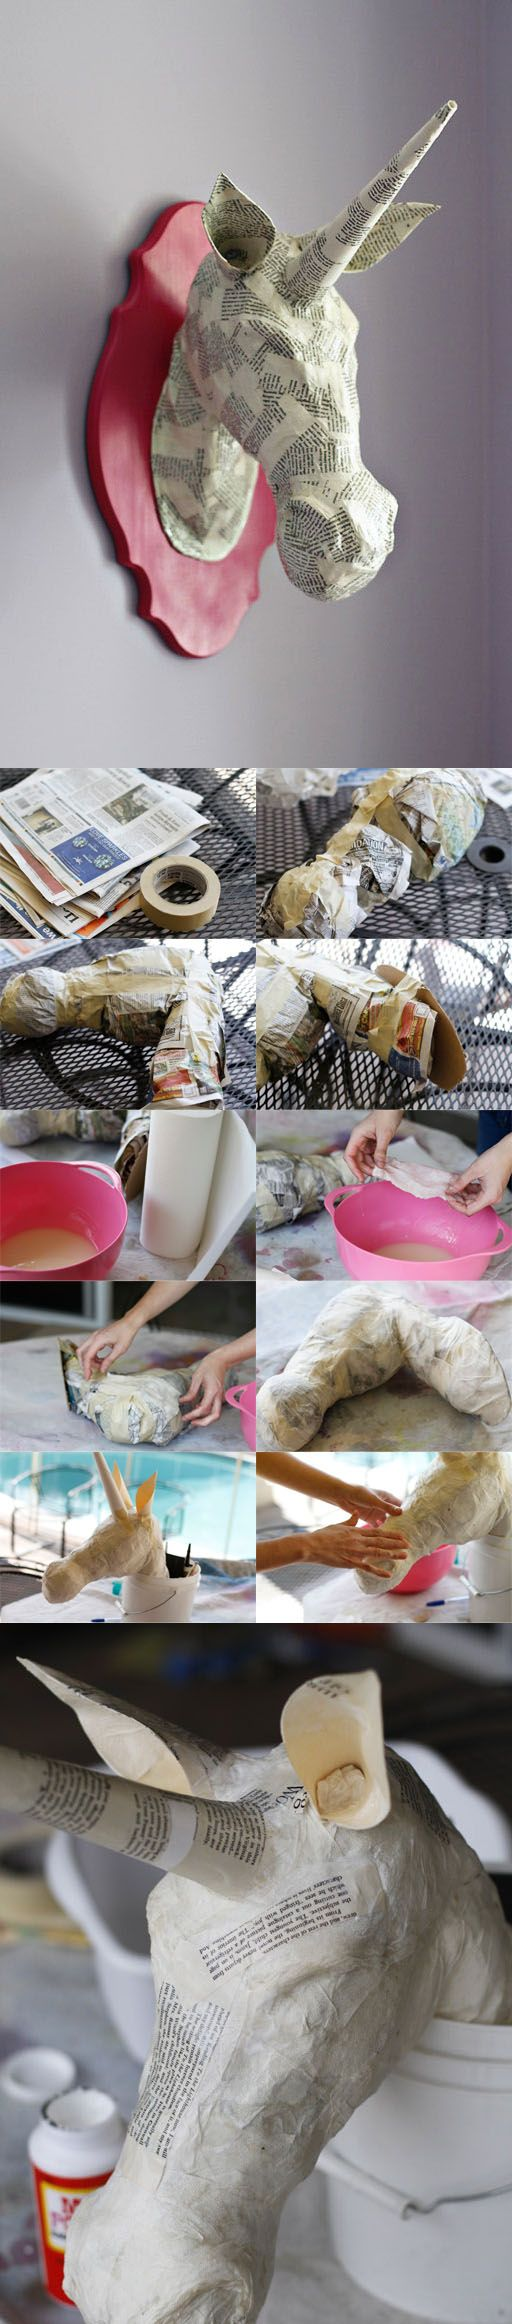 DIY :: PAPER MACHE ANIMAL HEADS (A TUTORIAL http://www.lilblueboo.com/2012/04/paper-mache-animal-heads-a-tutorial.html )